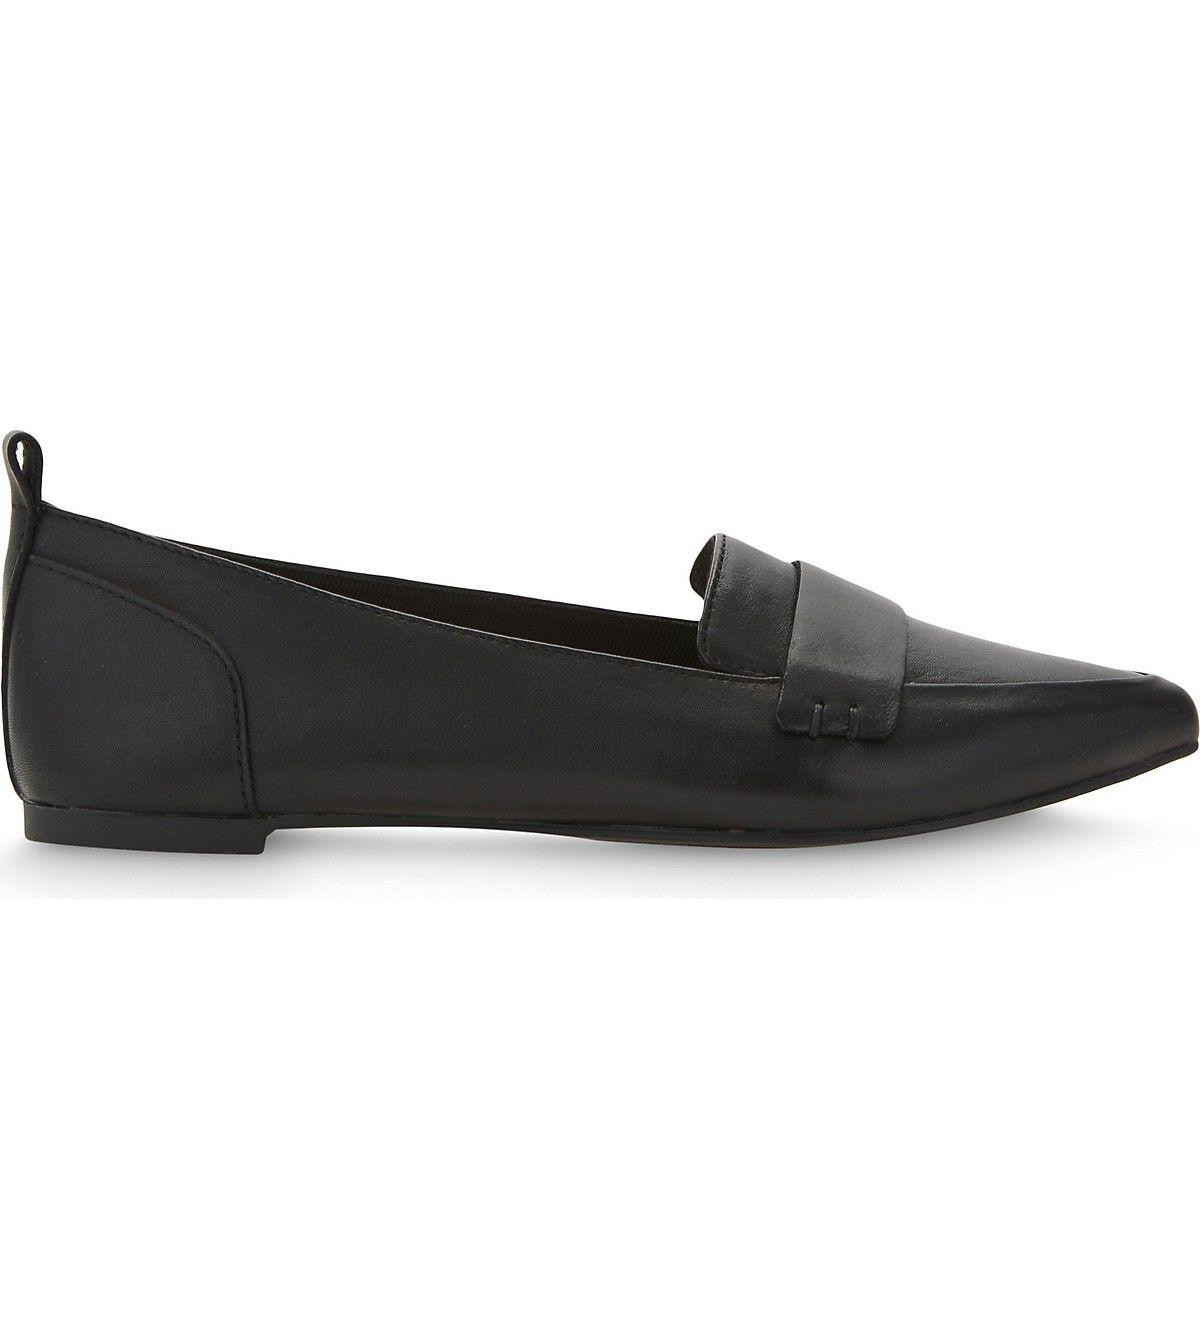 36241636616 ALDO - Cherryhill leather loafers